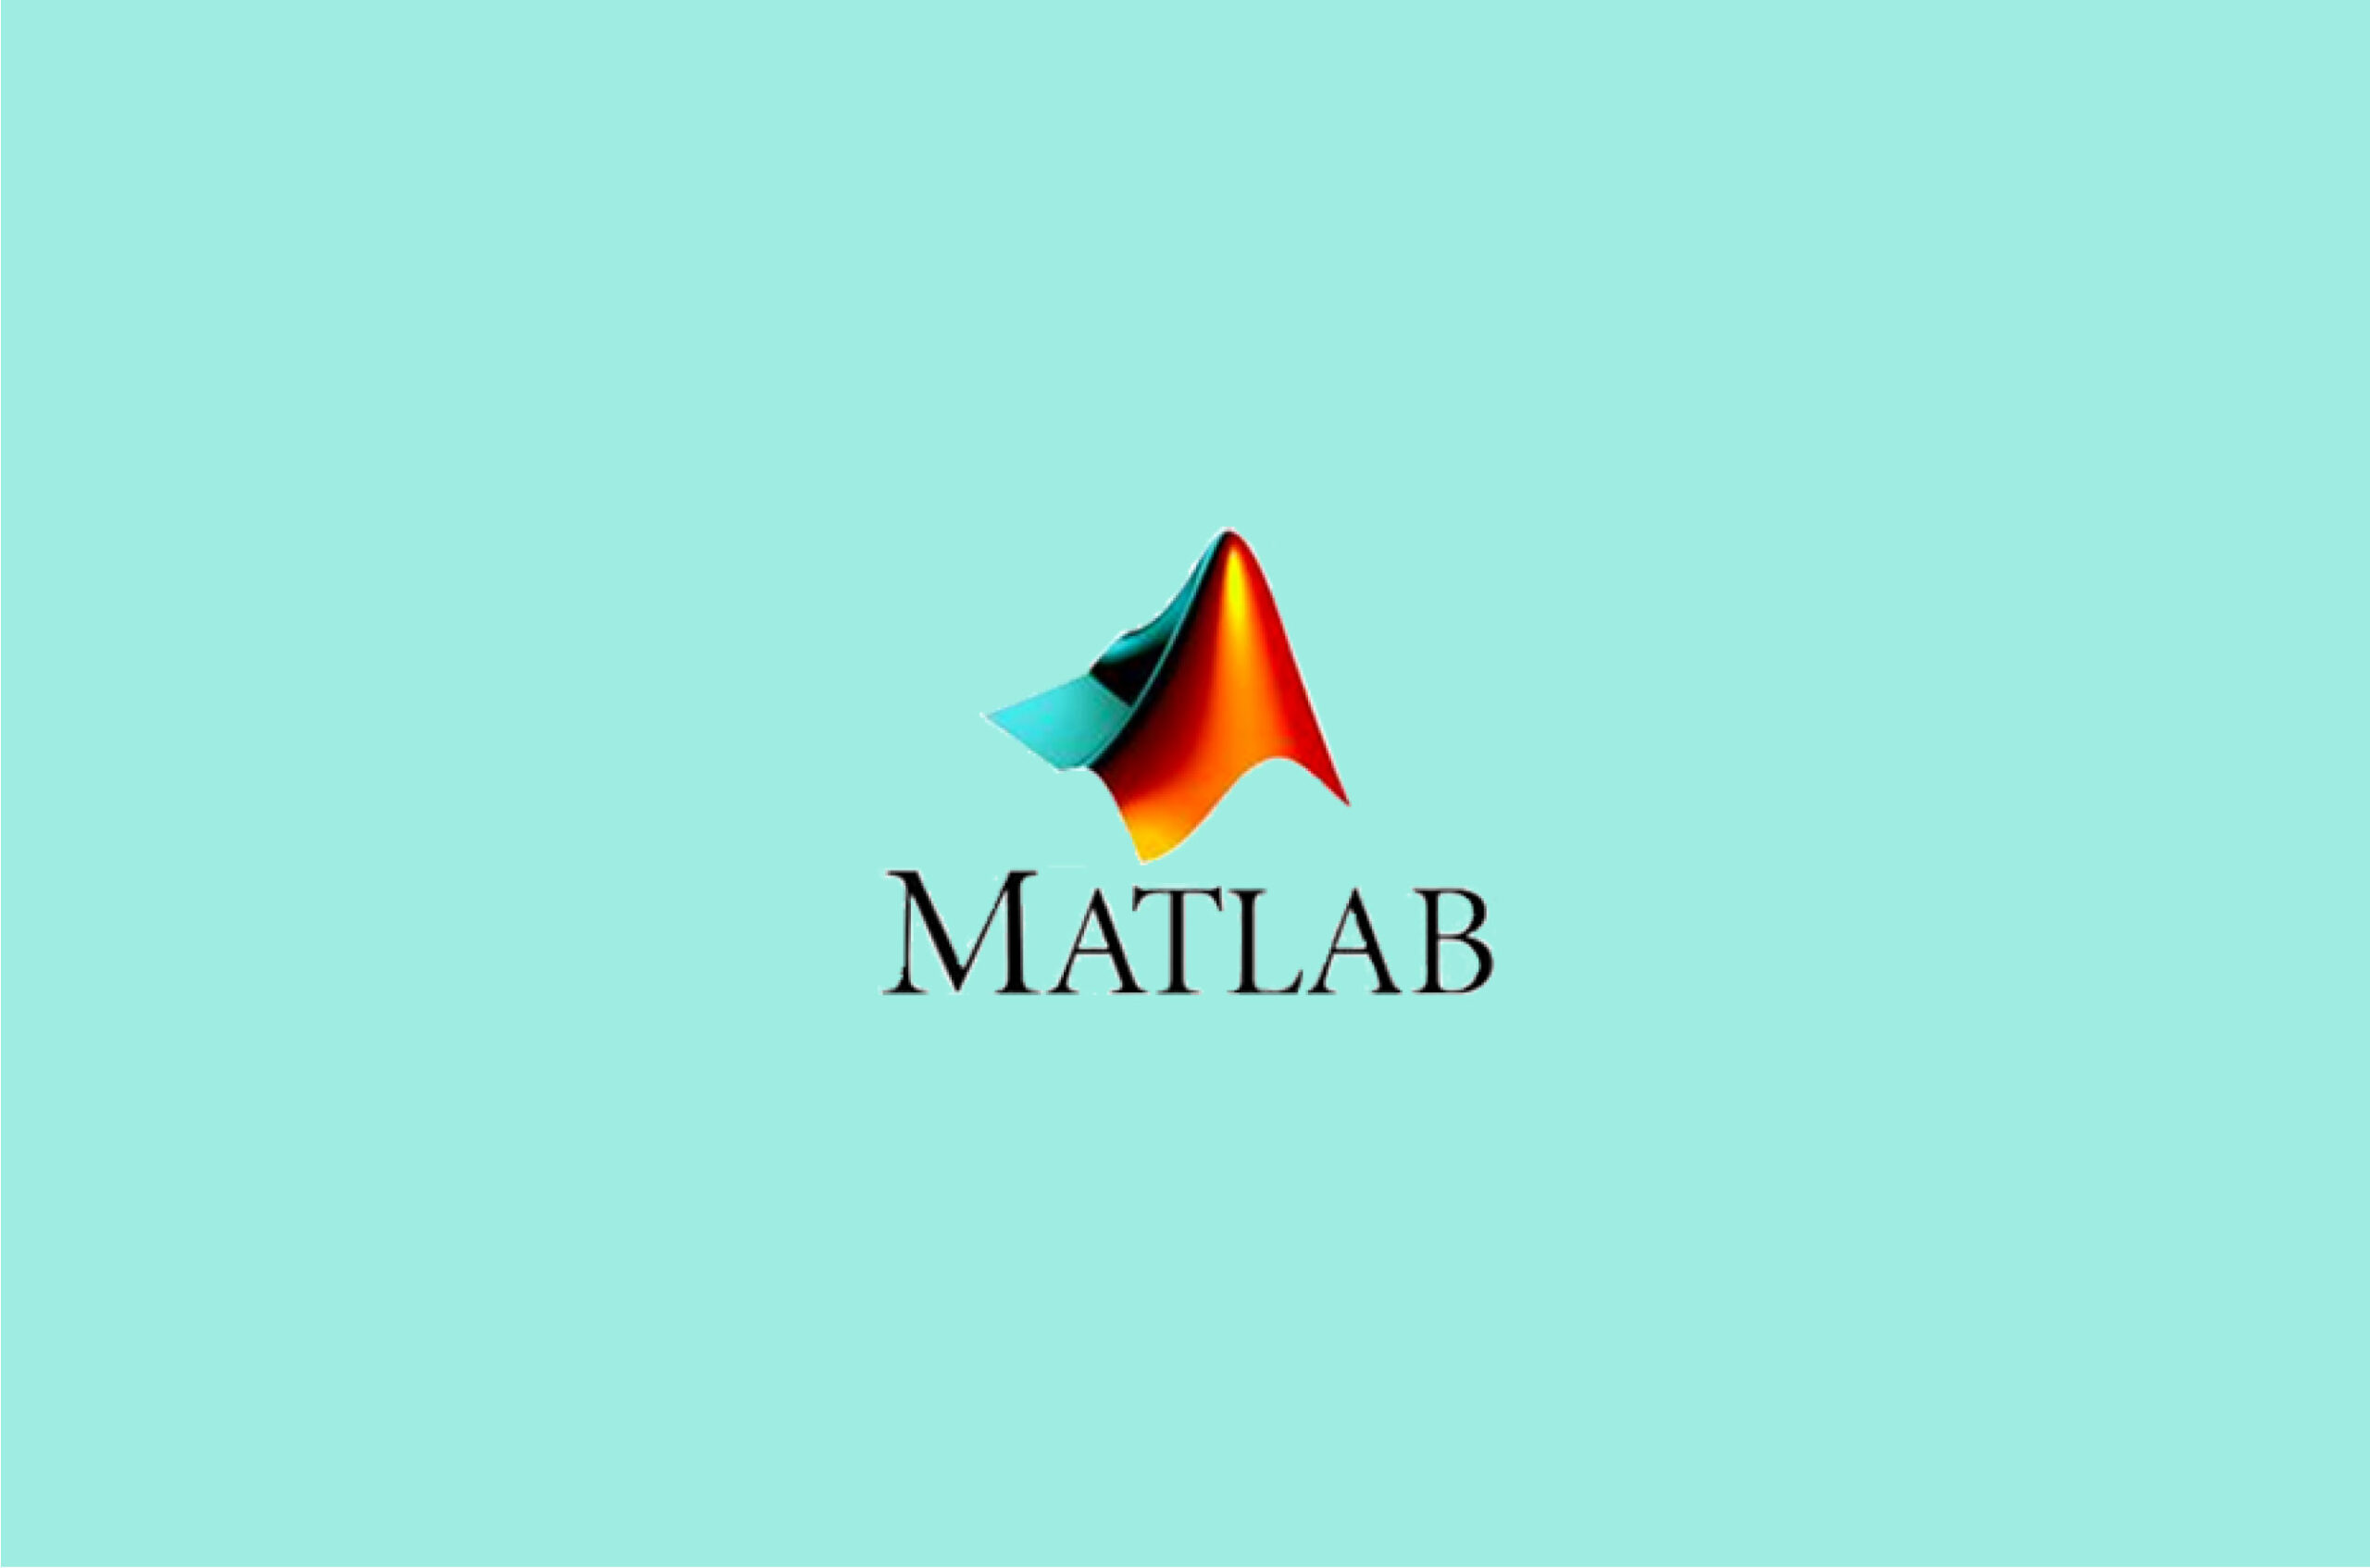 Copy of Matlab